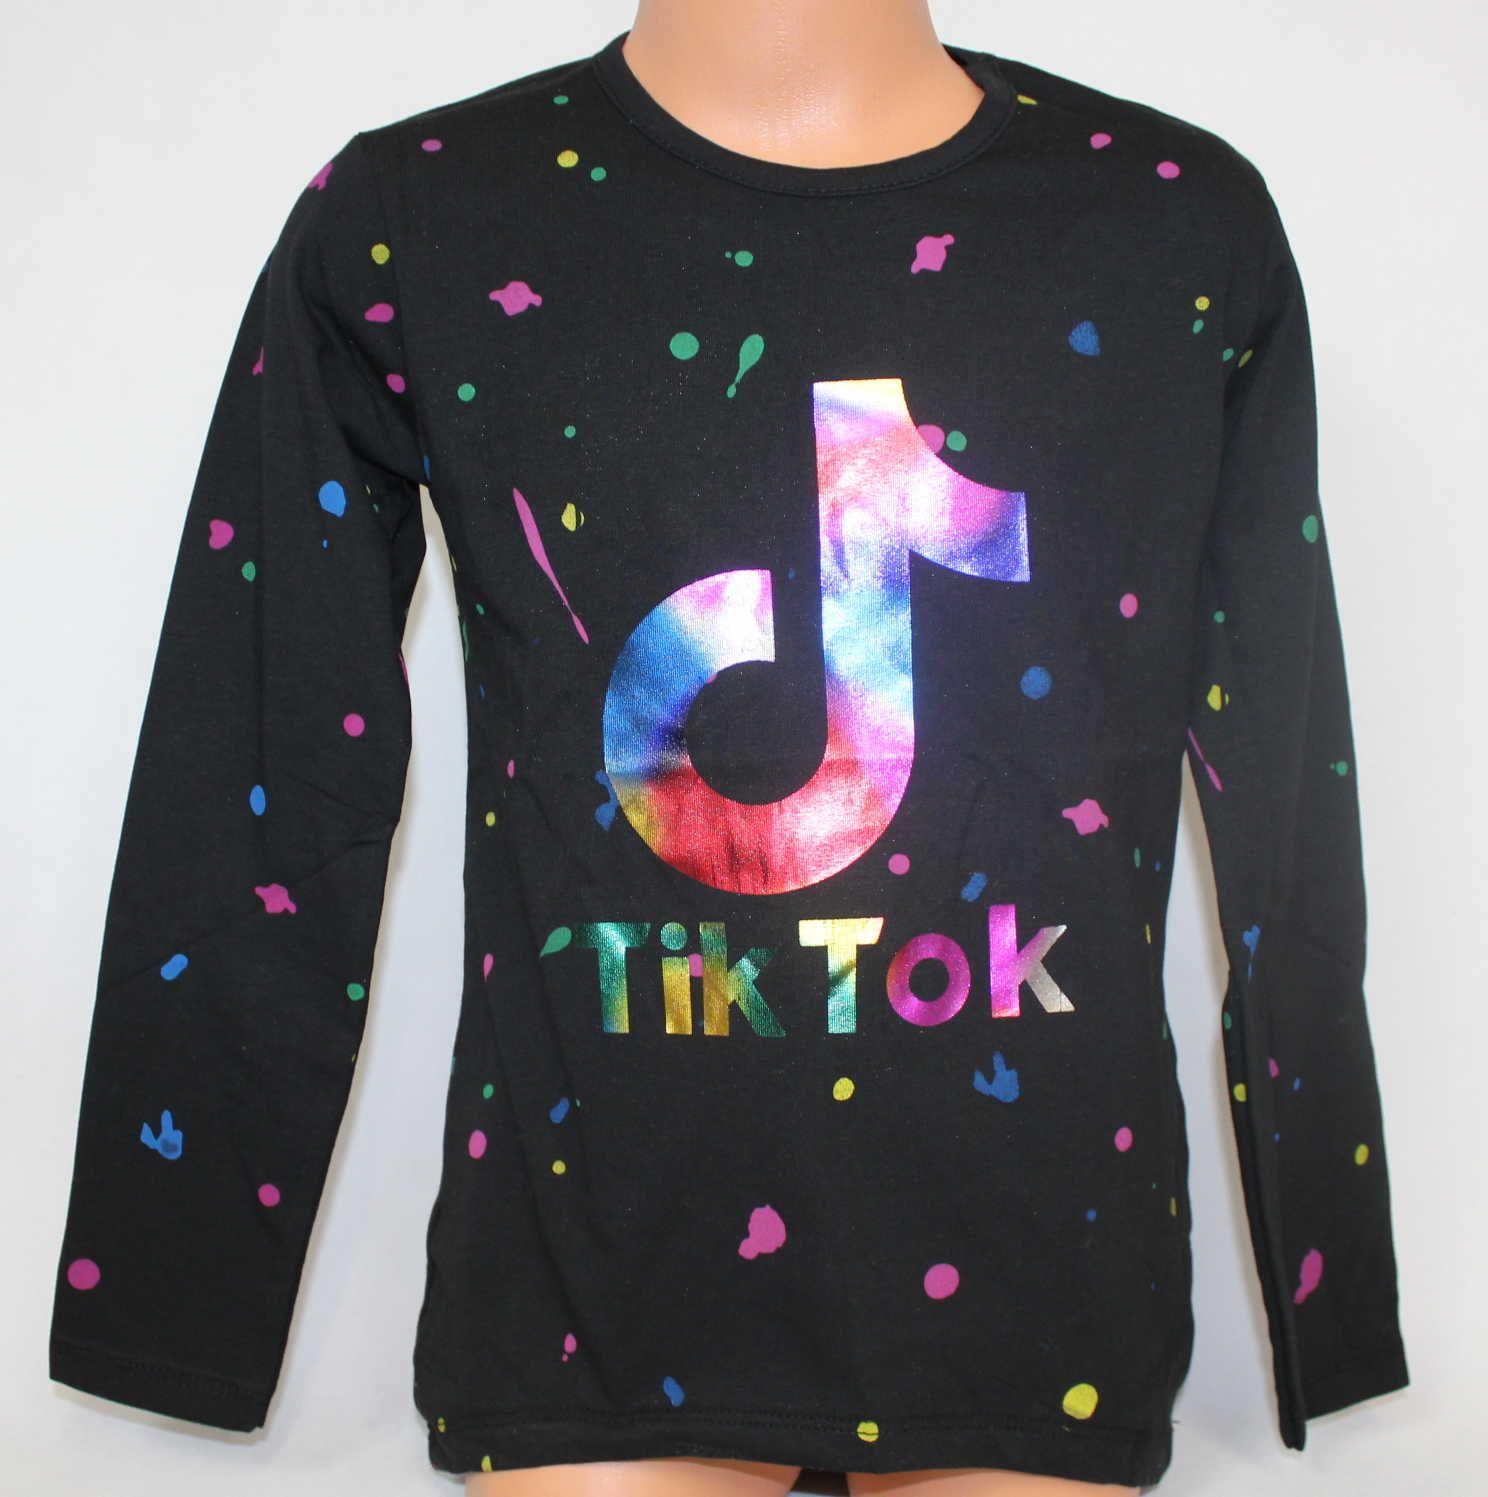 Tik Tok tričko, triko dlouhý rukáv Tik Tok, Tik Tok oblečení, bavlněné tričko Tik Tok, dívčí tričko TIK TOK Tomurcuk